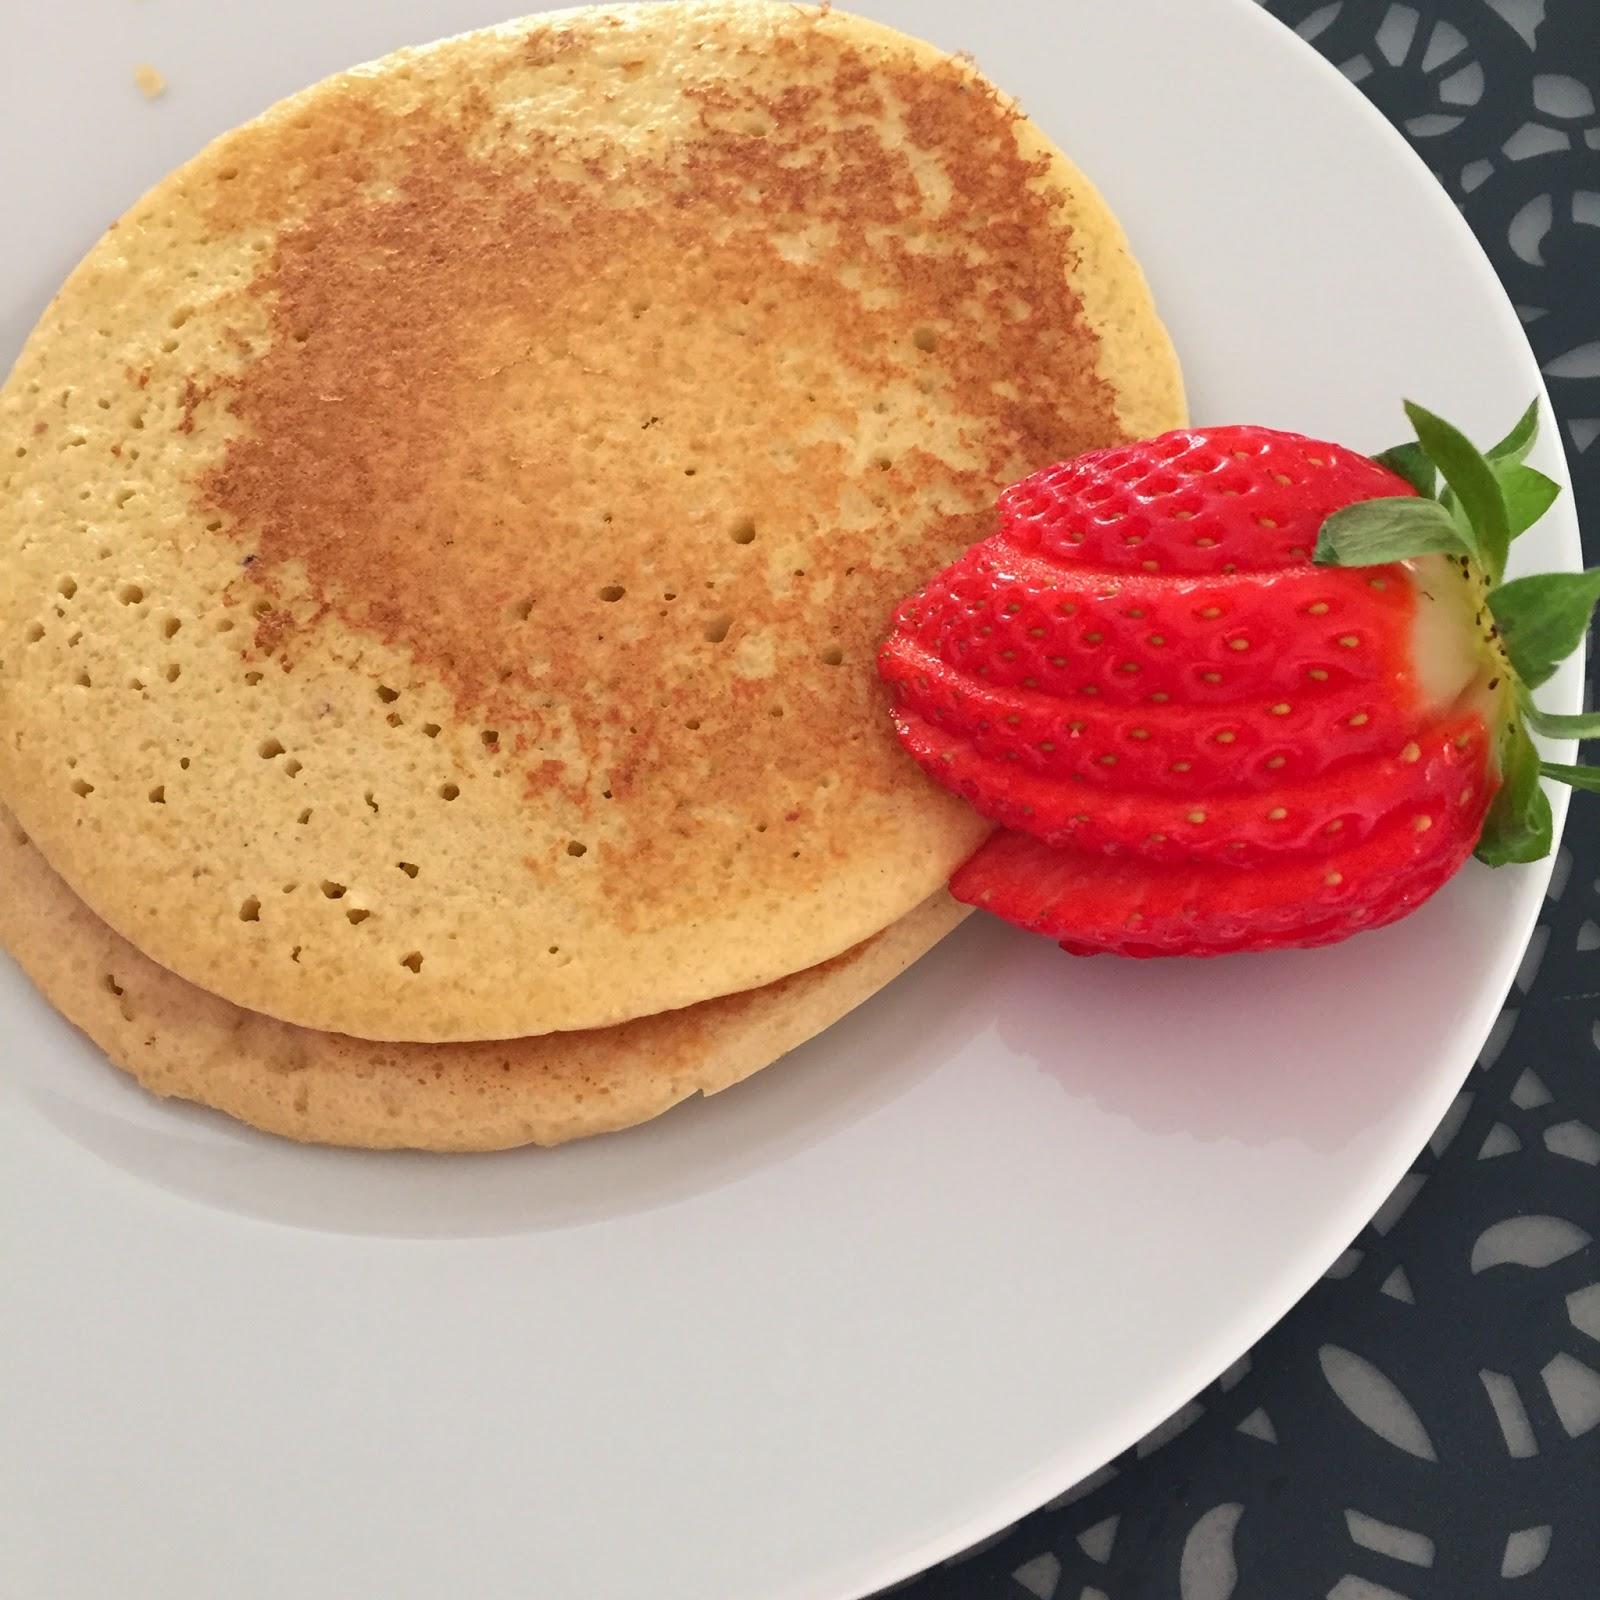 tortitas almendra, almond pancakes, panquecas almendra